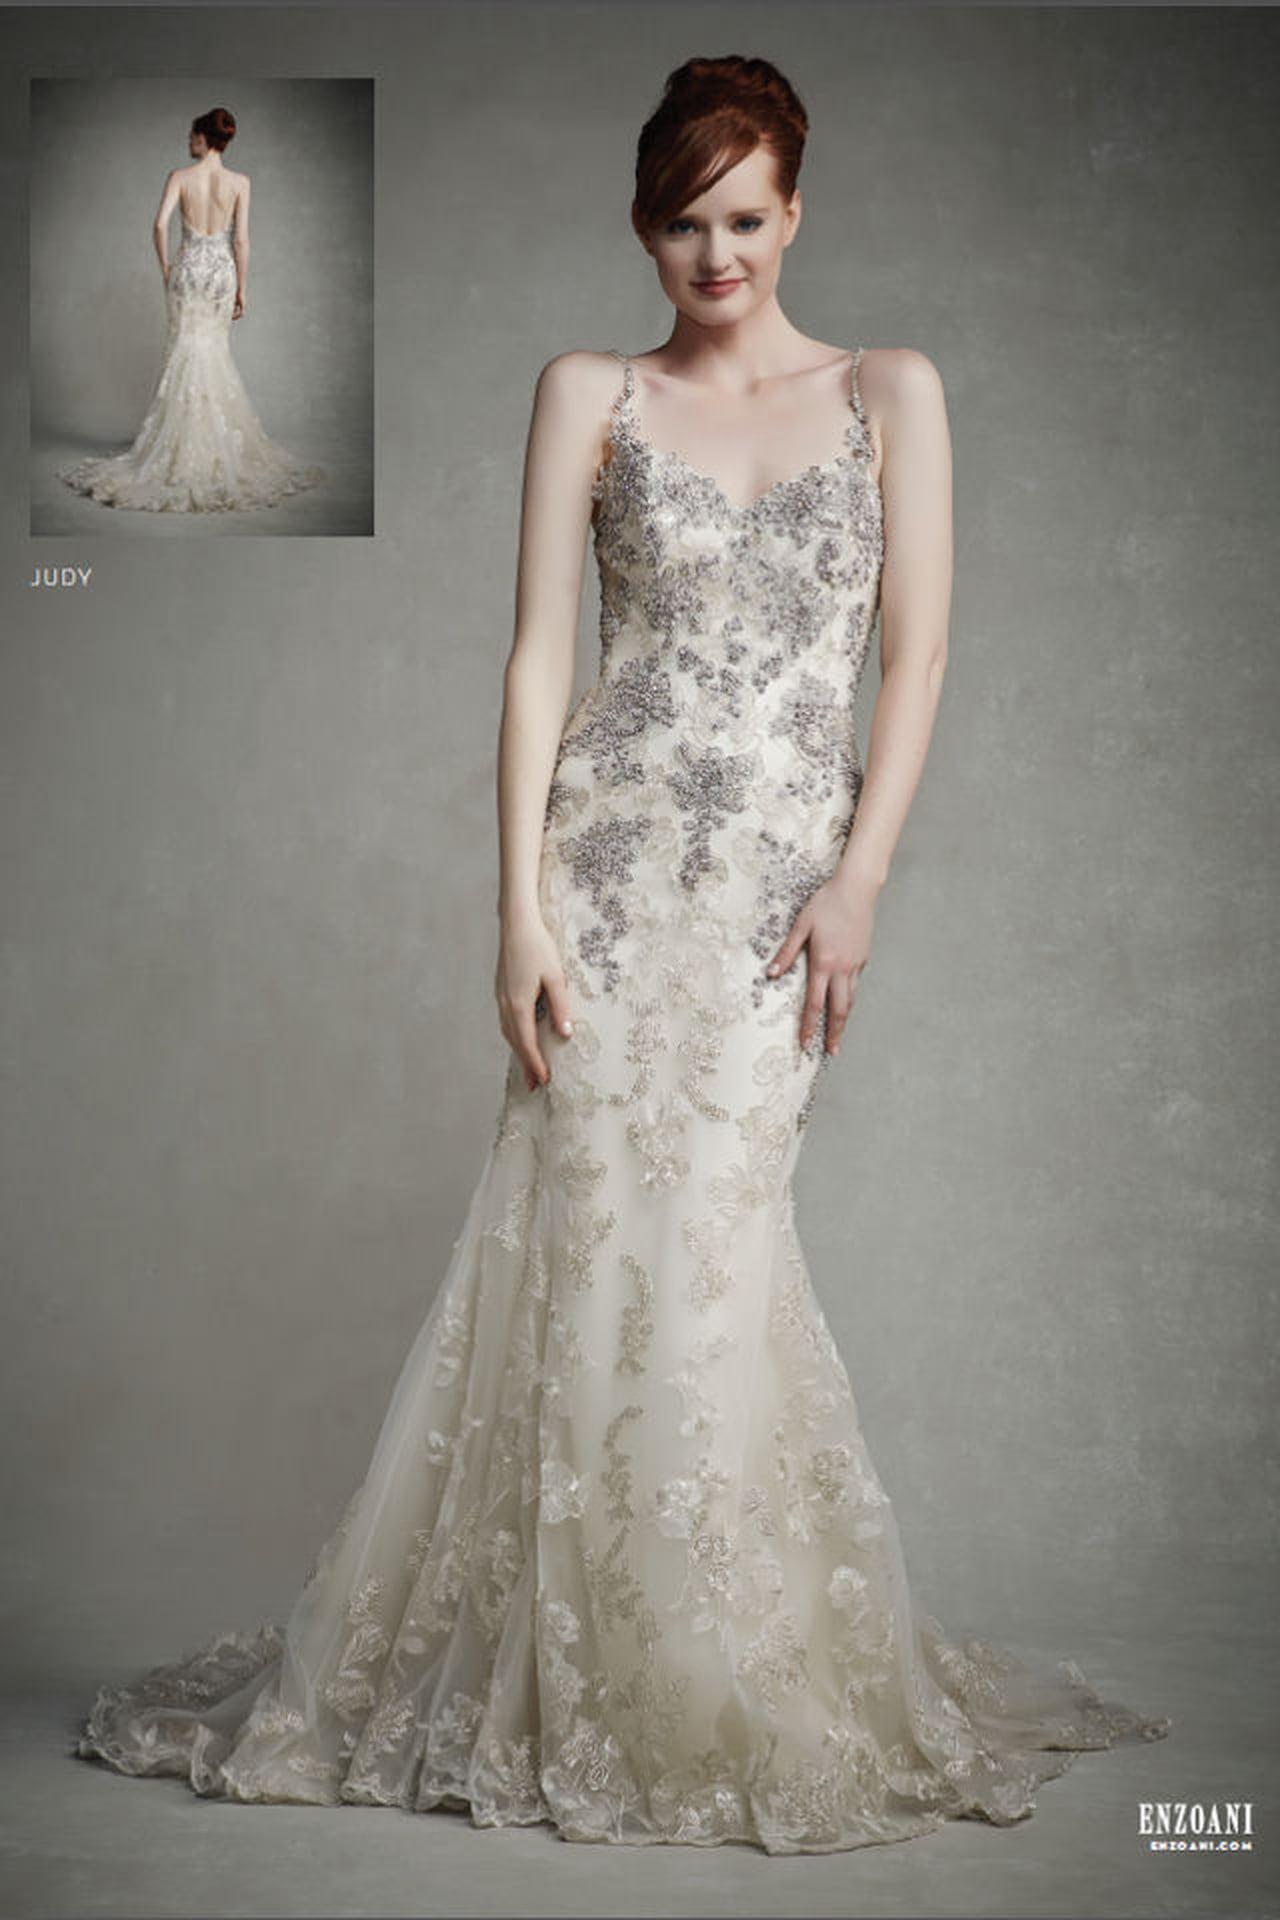 hara dara wedding dresses photo - 1